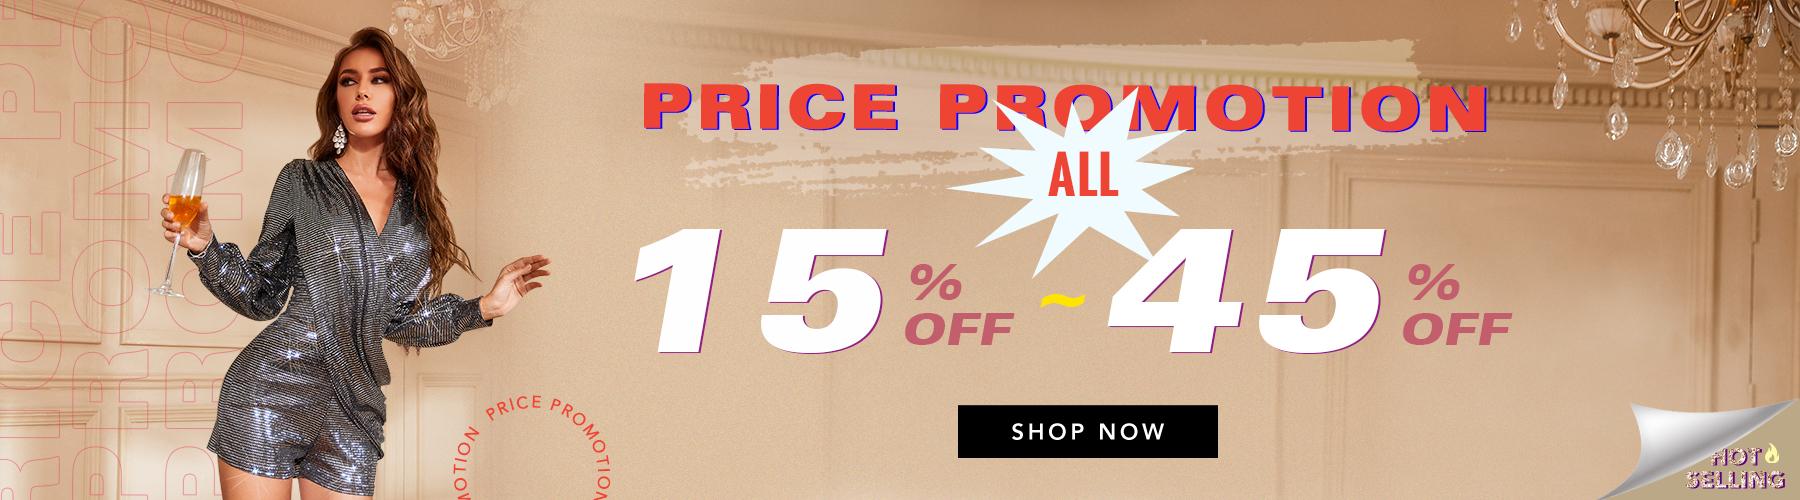 Price-Promotion